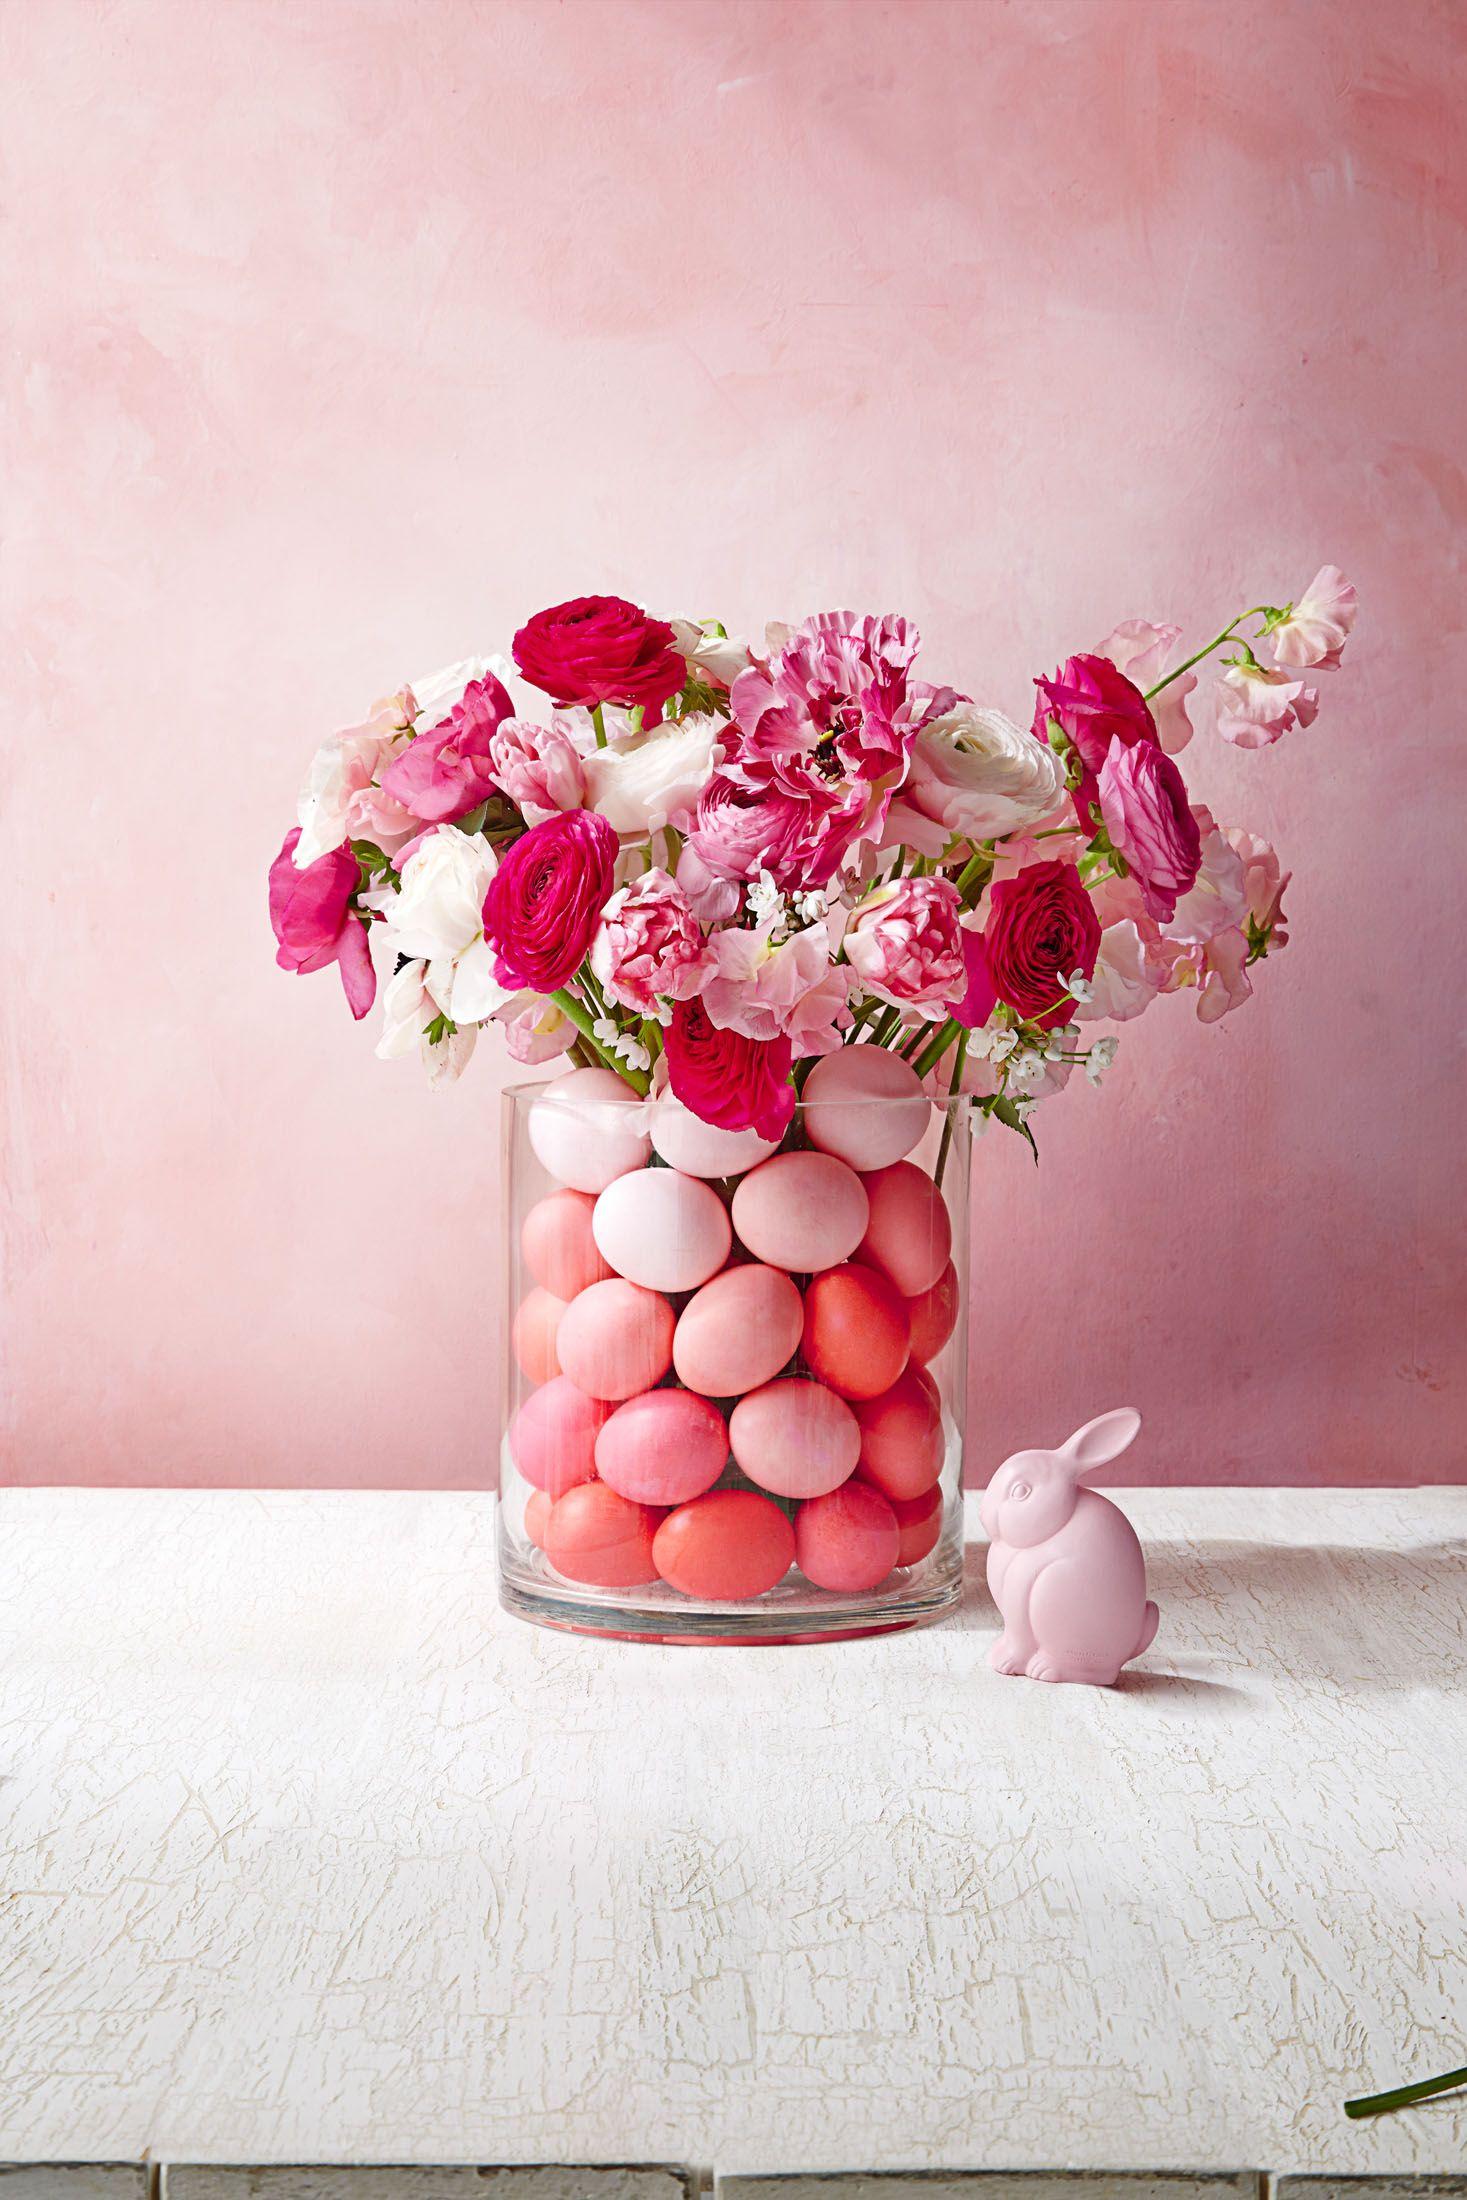 Easter Flowers Pink Ombré Egg Filled Vase & 23 Best Easter Flowers and Centerpieces - Floral Arrangements for ...